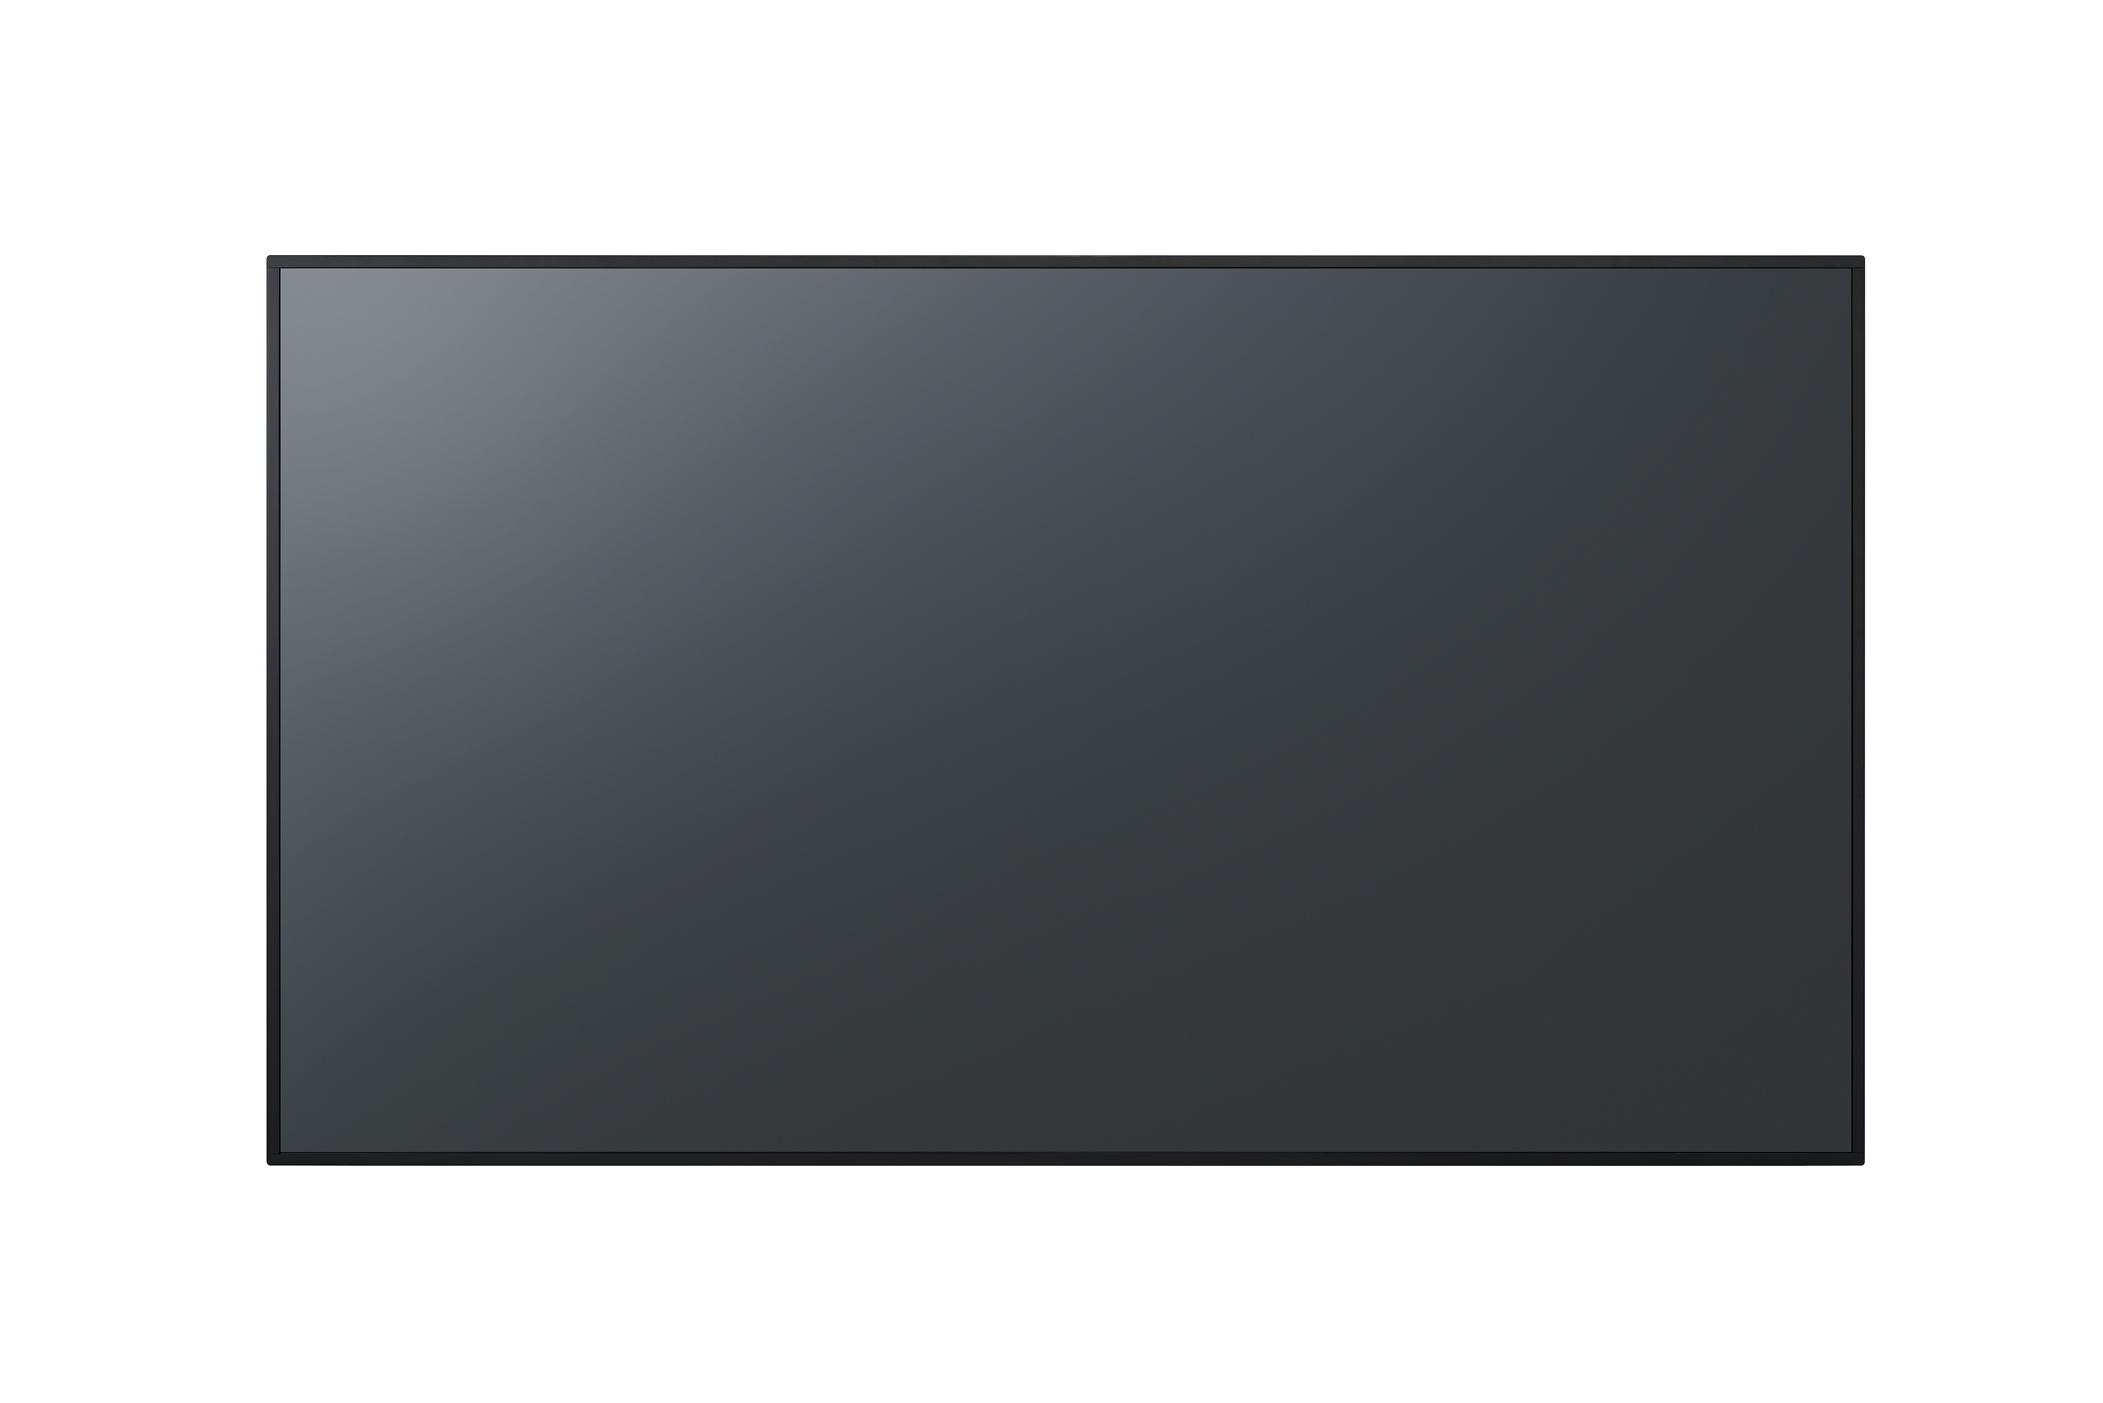 PANASONIC Panasonic TH-65SQ1W - Ecran Professionnel Intérieur 65´´